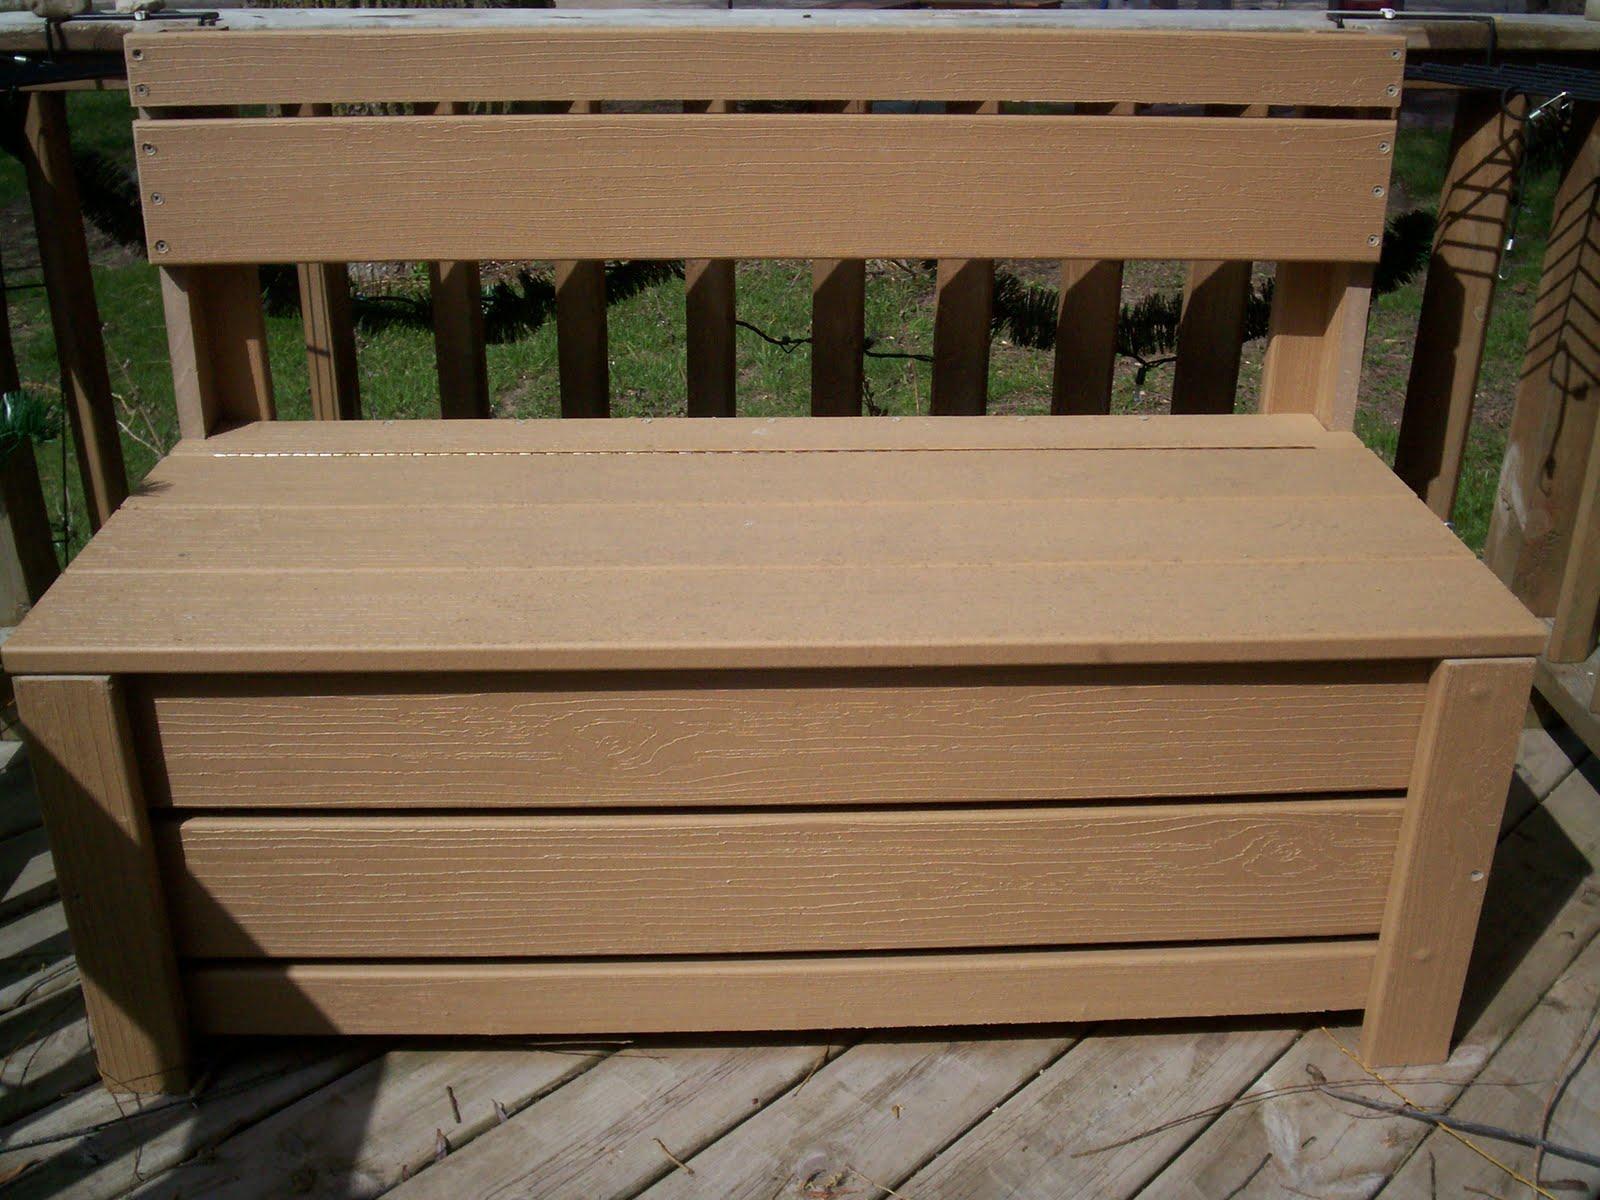 Storage Bench Plans Outdoor Pdf Woodworking